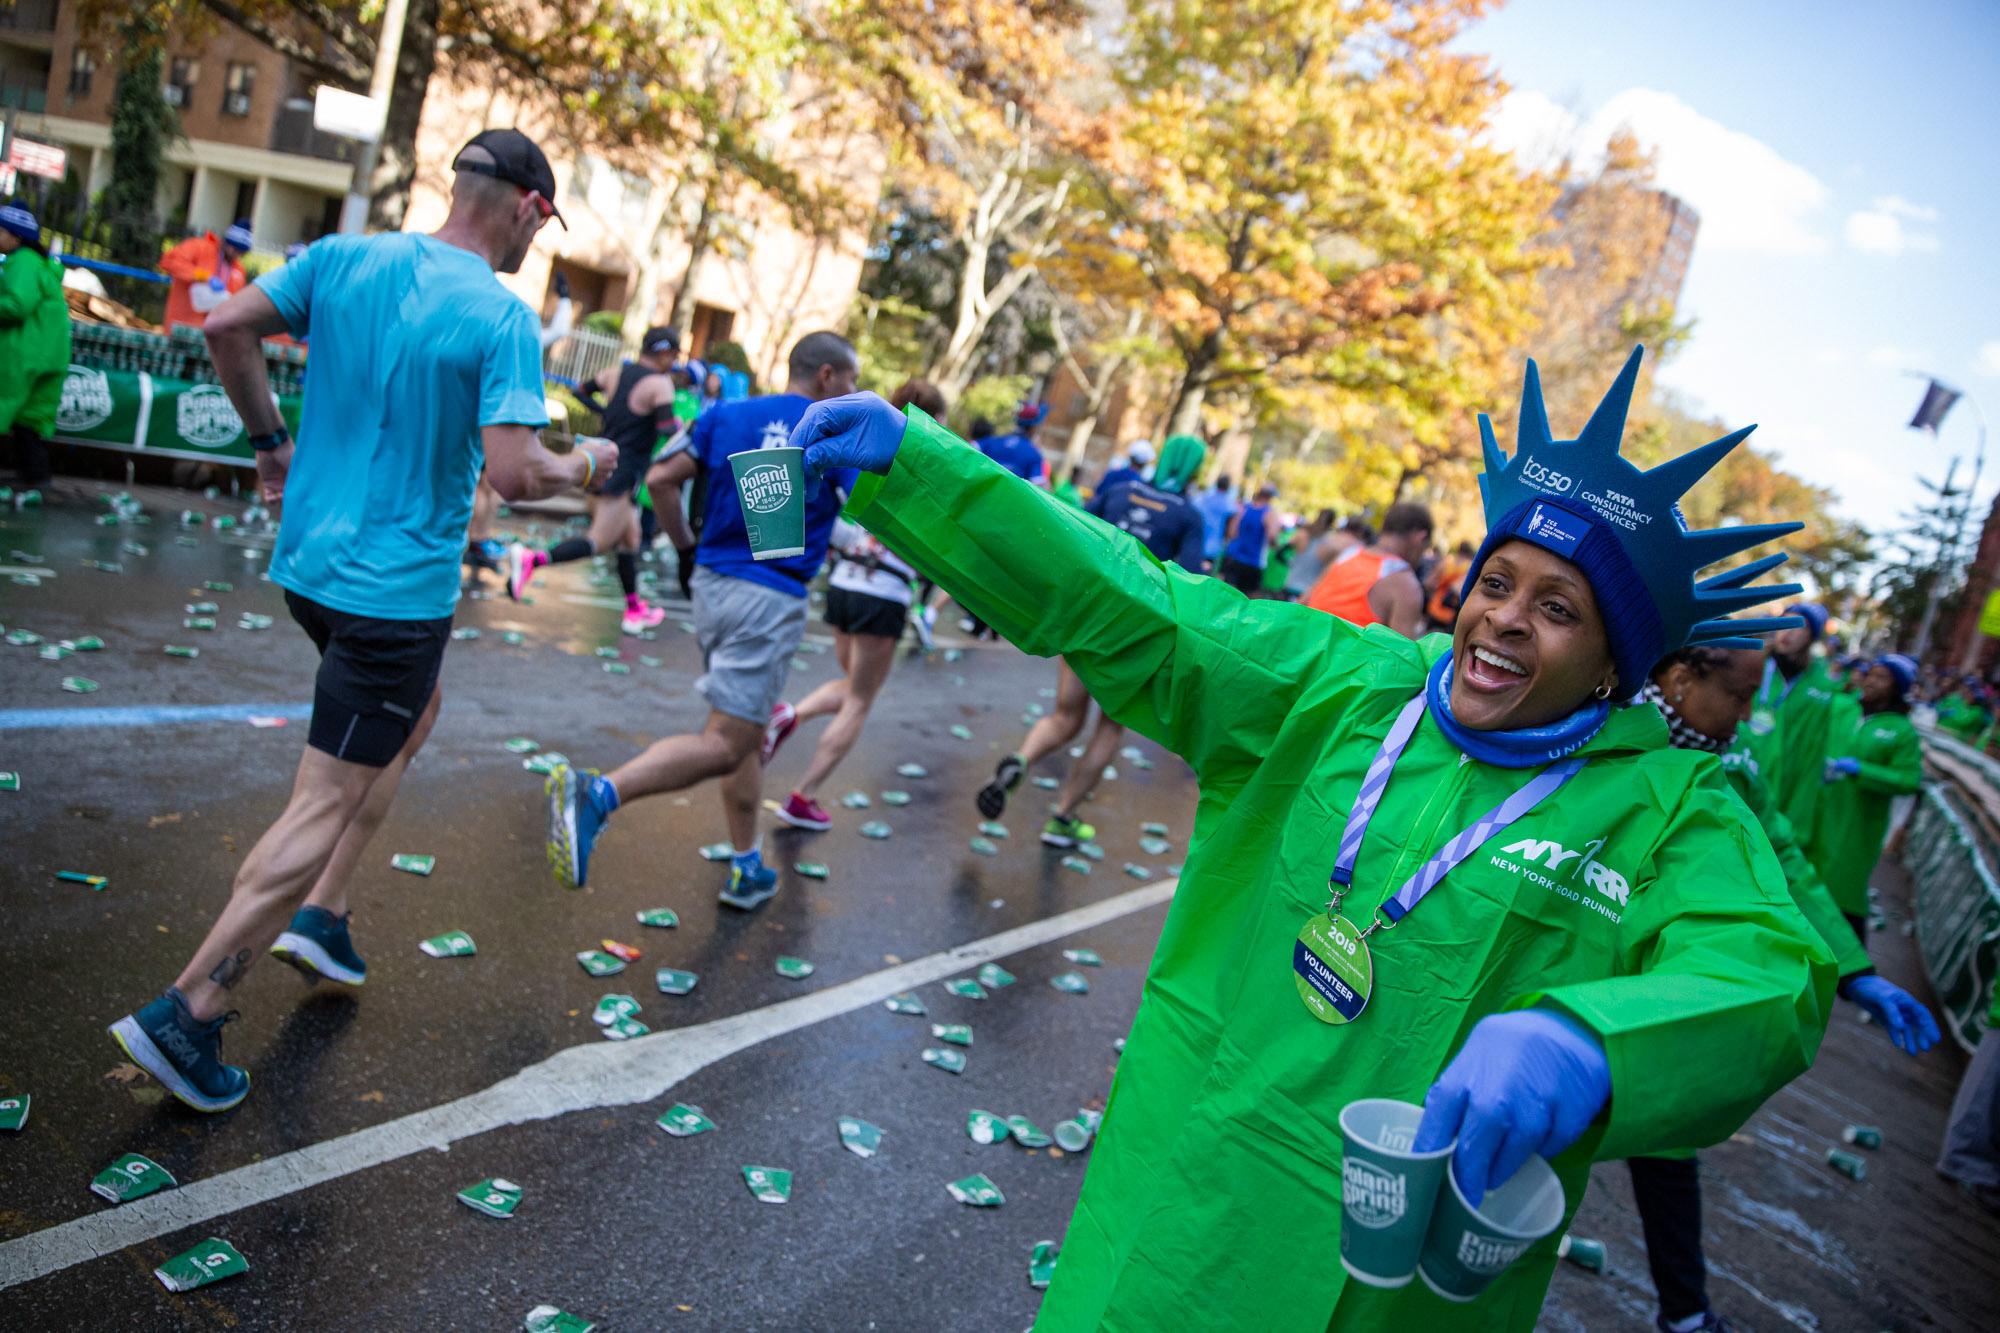 Volunteer at 2019 TCS New York City Marathon